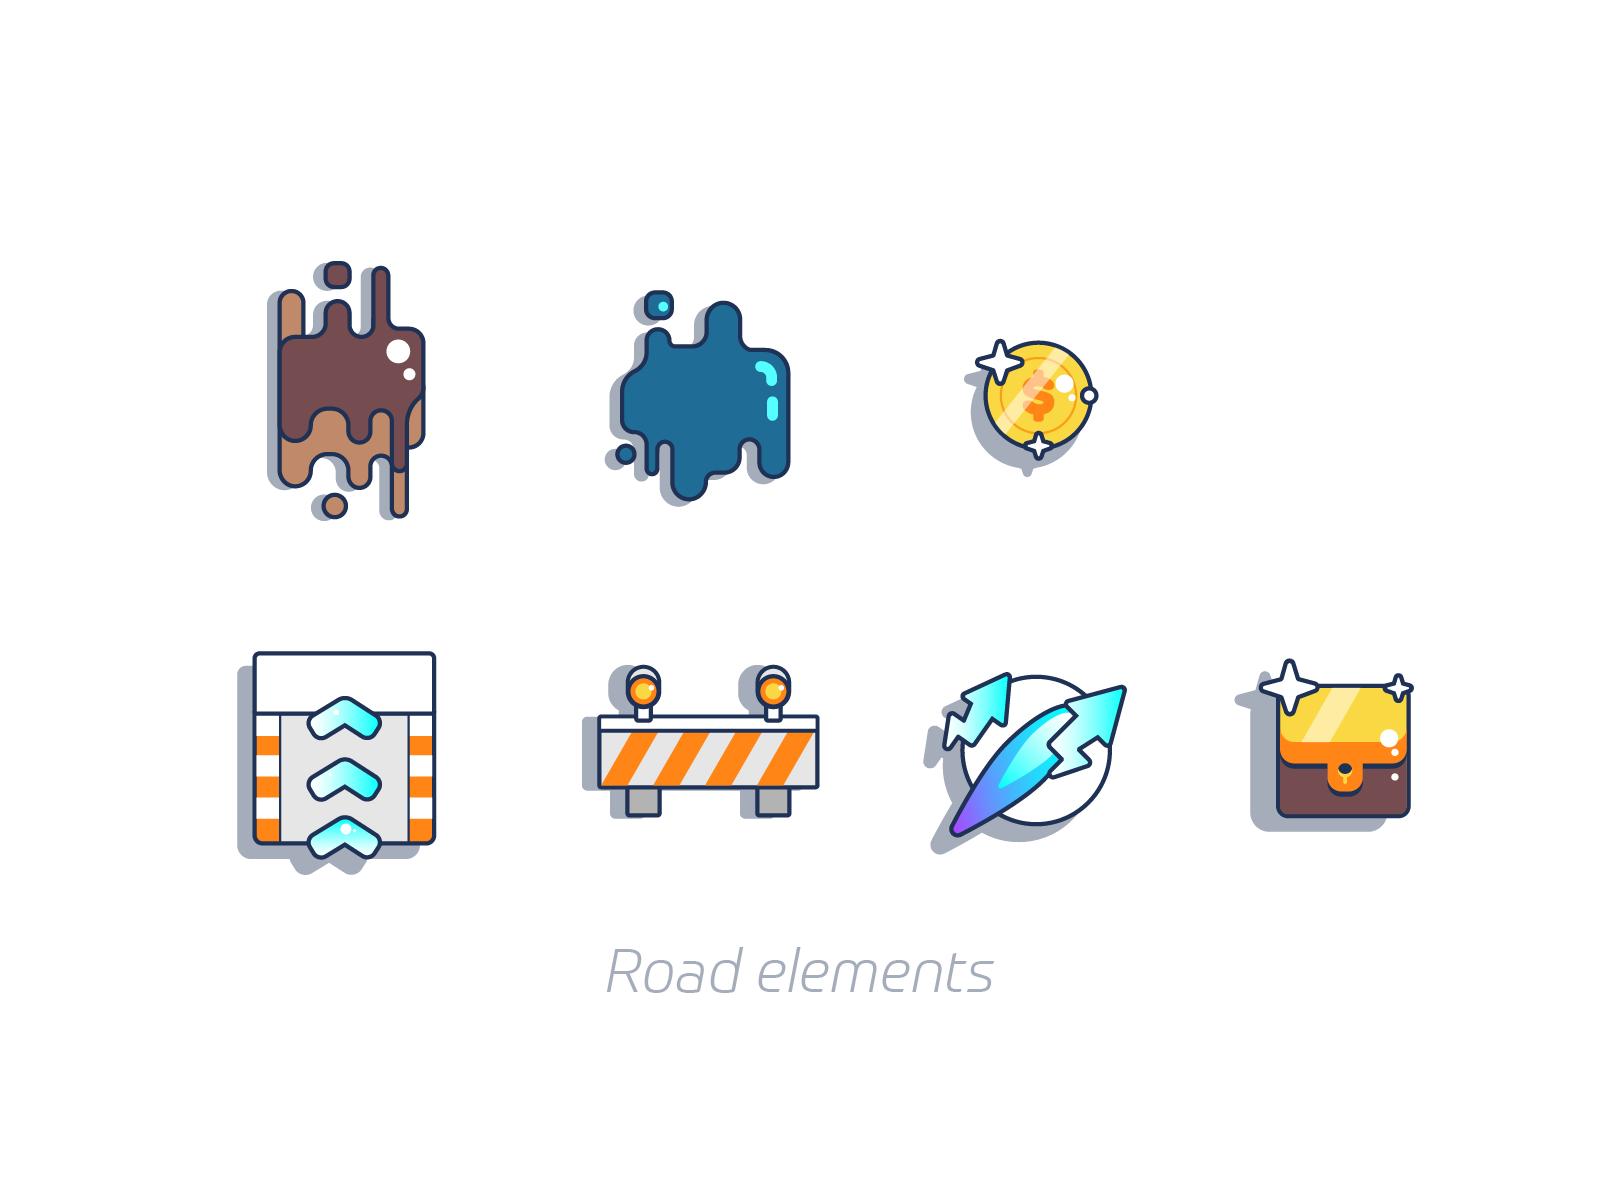 Road elements graphic design illustration